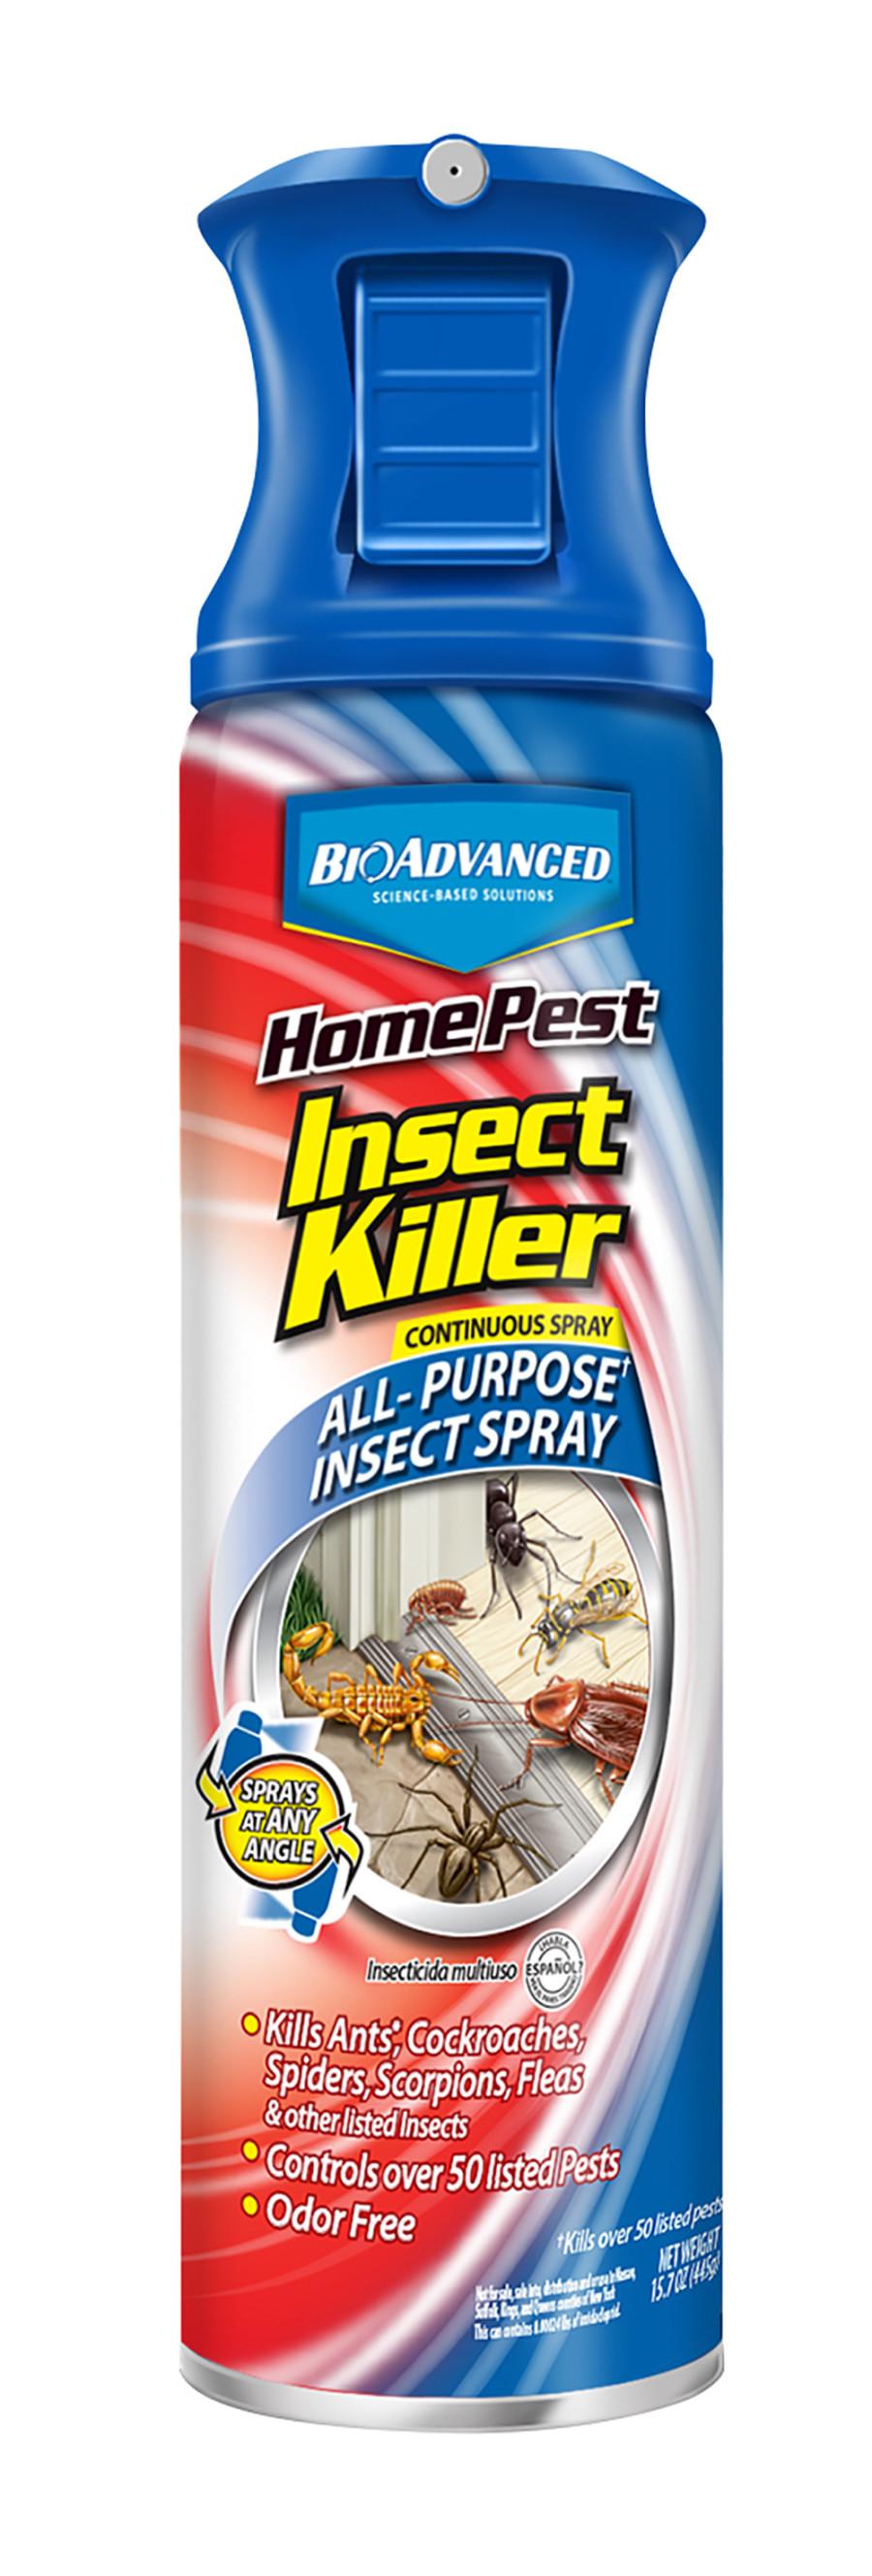 BioAdvanced Home Pest Insect Killer Continuous Spray 12ea/15 oz